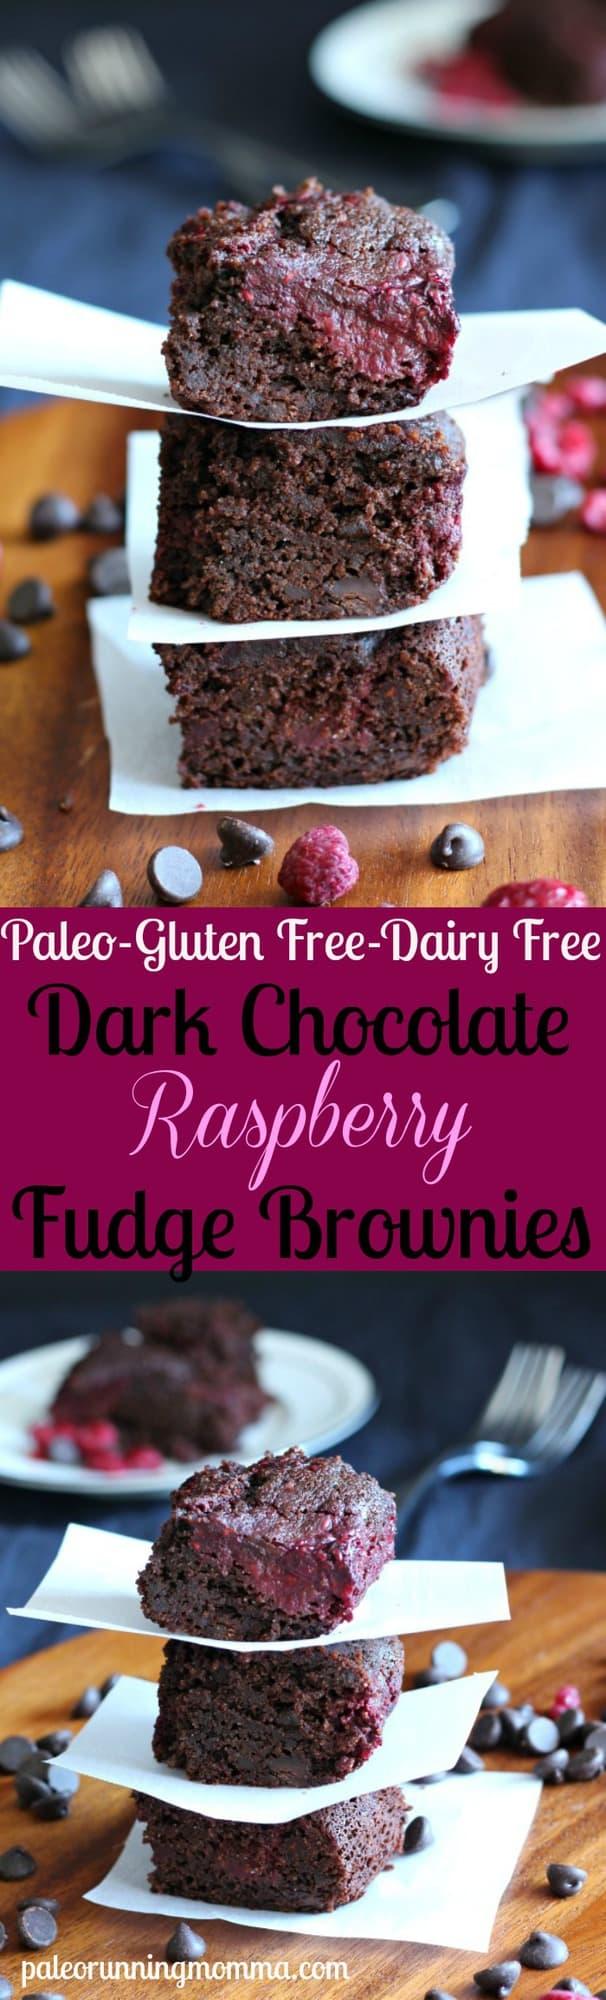 Dark Chocolate Raspberry Fudge Brownies - #paleo brownies with an easy homemade raspberry swirl #glutenfree #dairyfree #grainfree